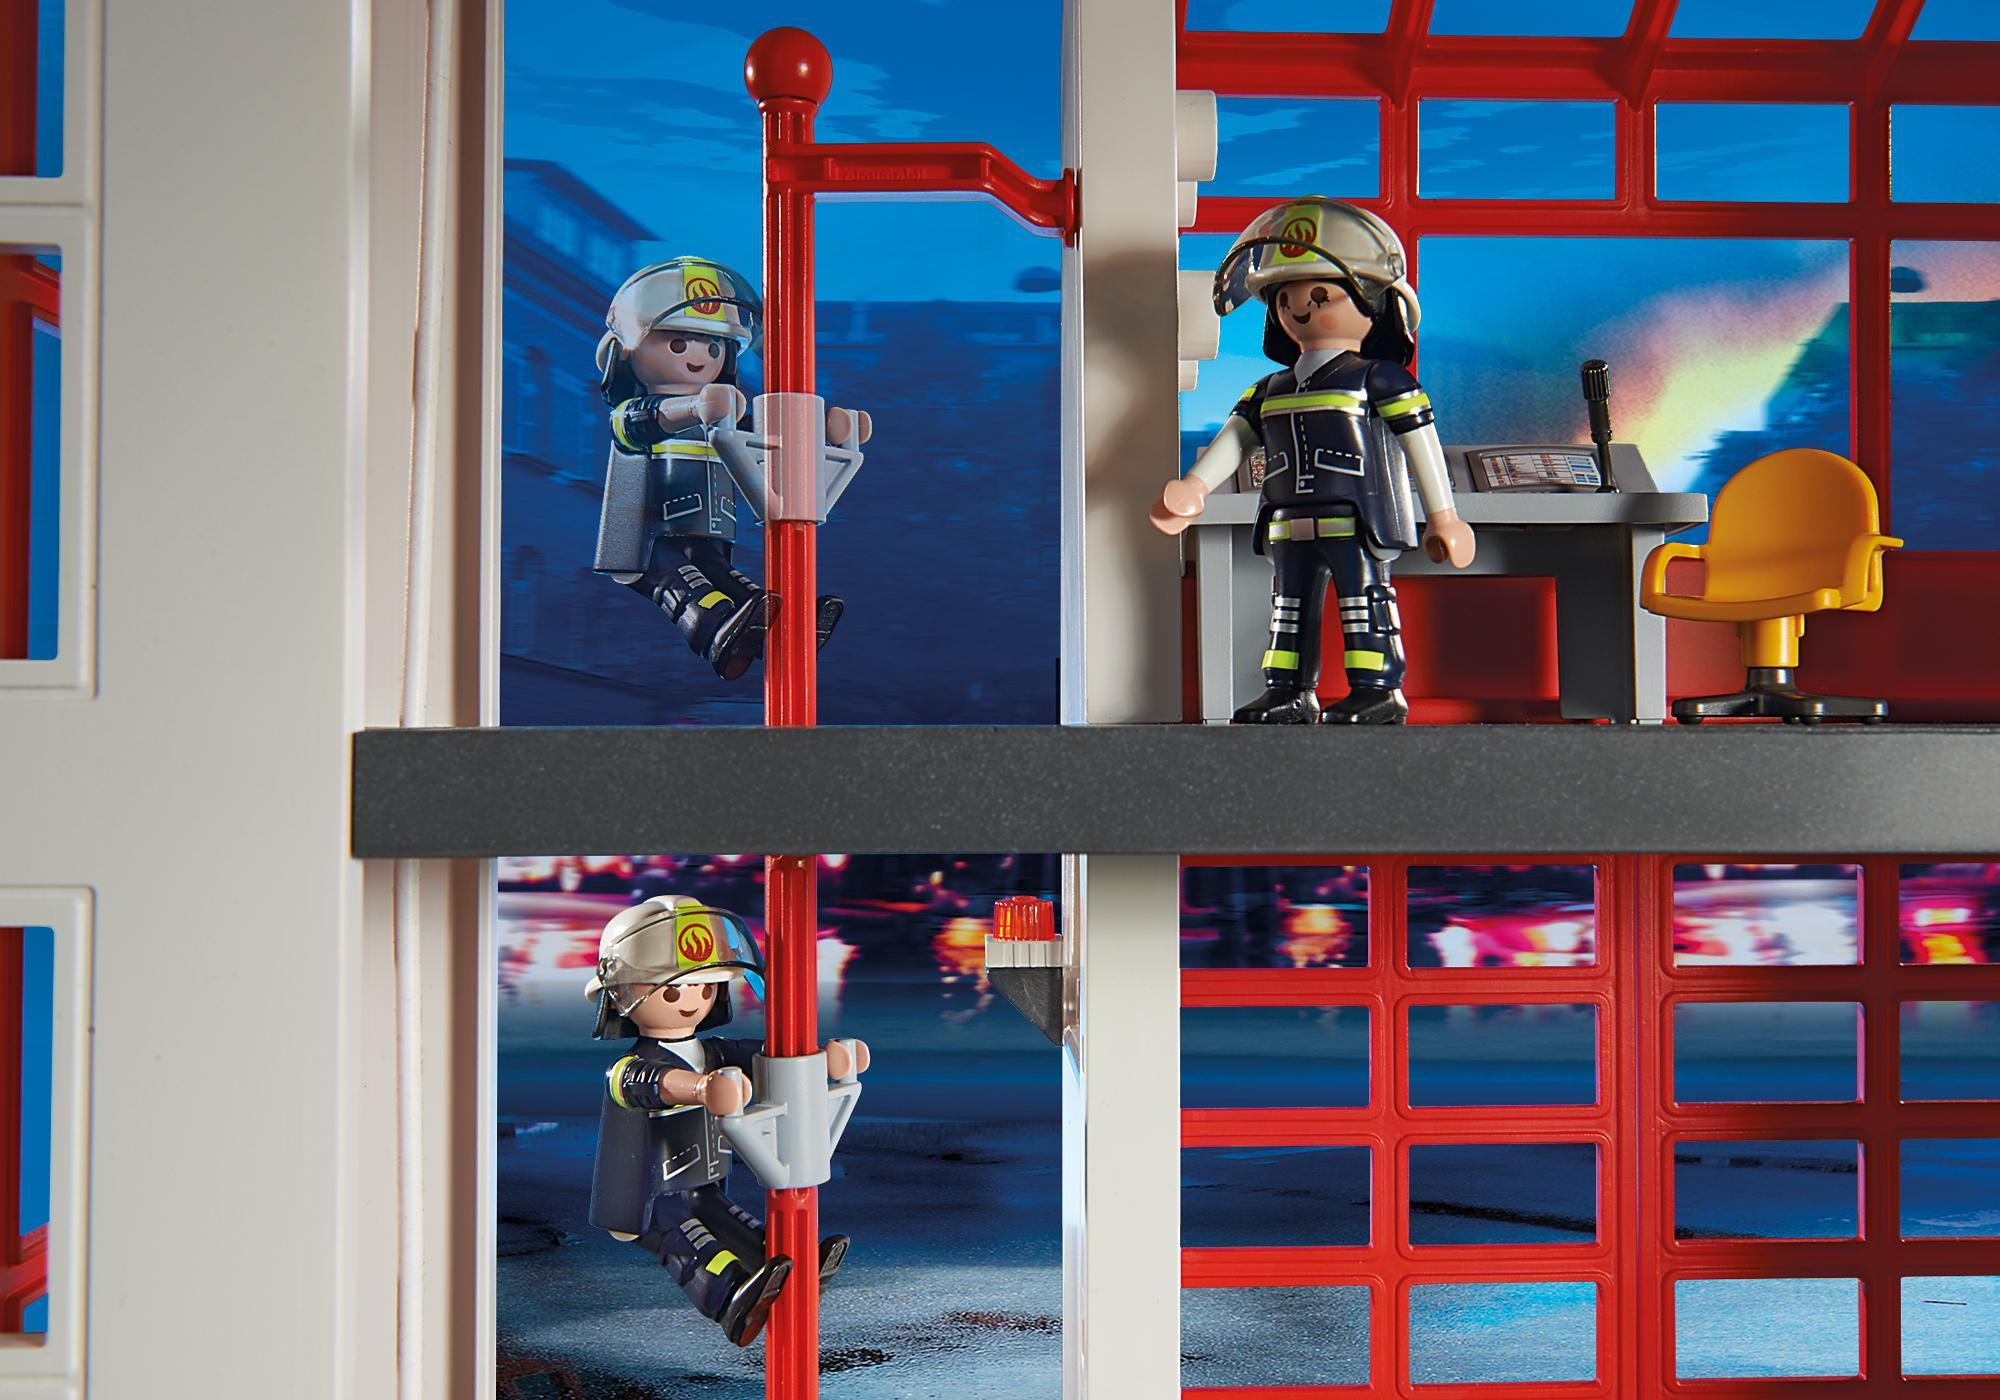 http://media.playmobil.com/i/playmobil/5361_product_extra3/Fire Station with Alarm